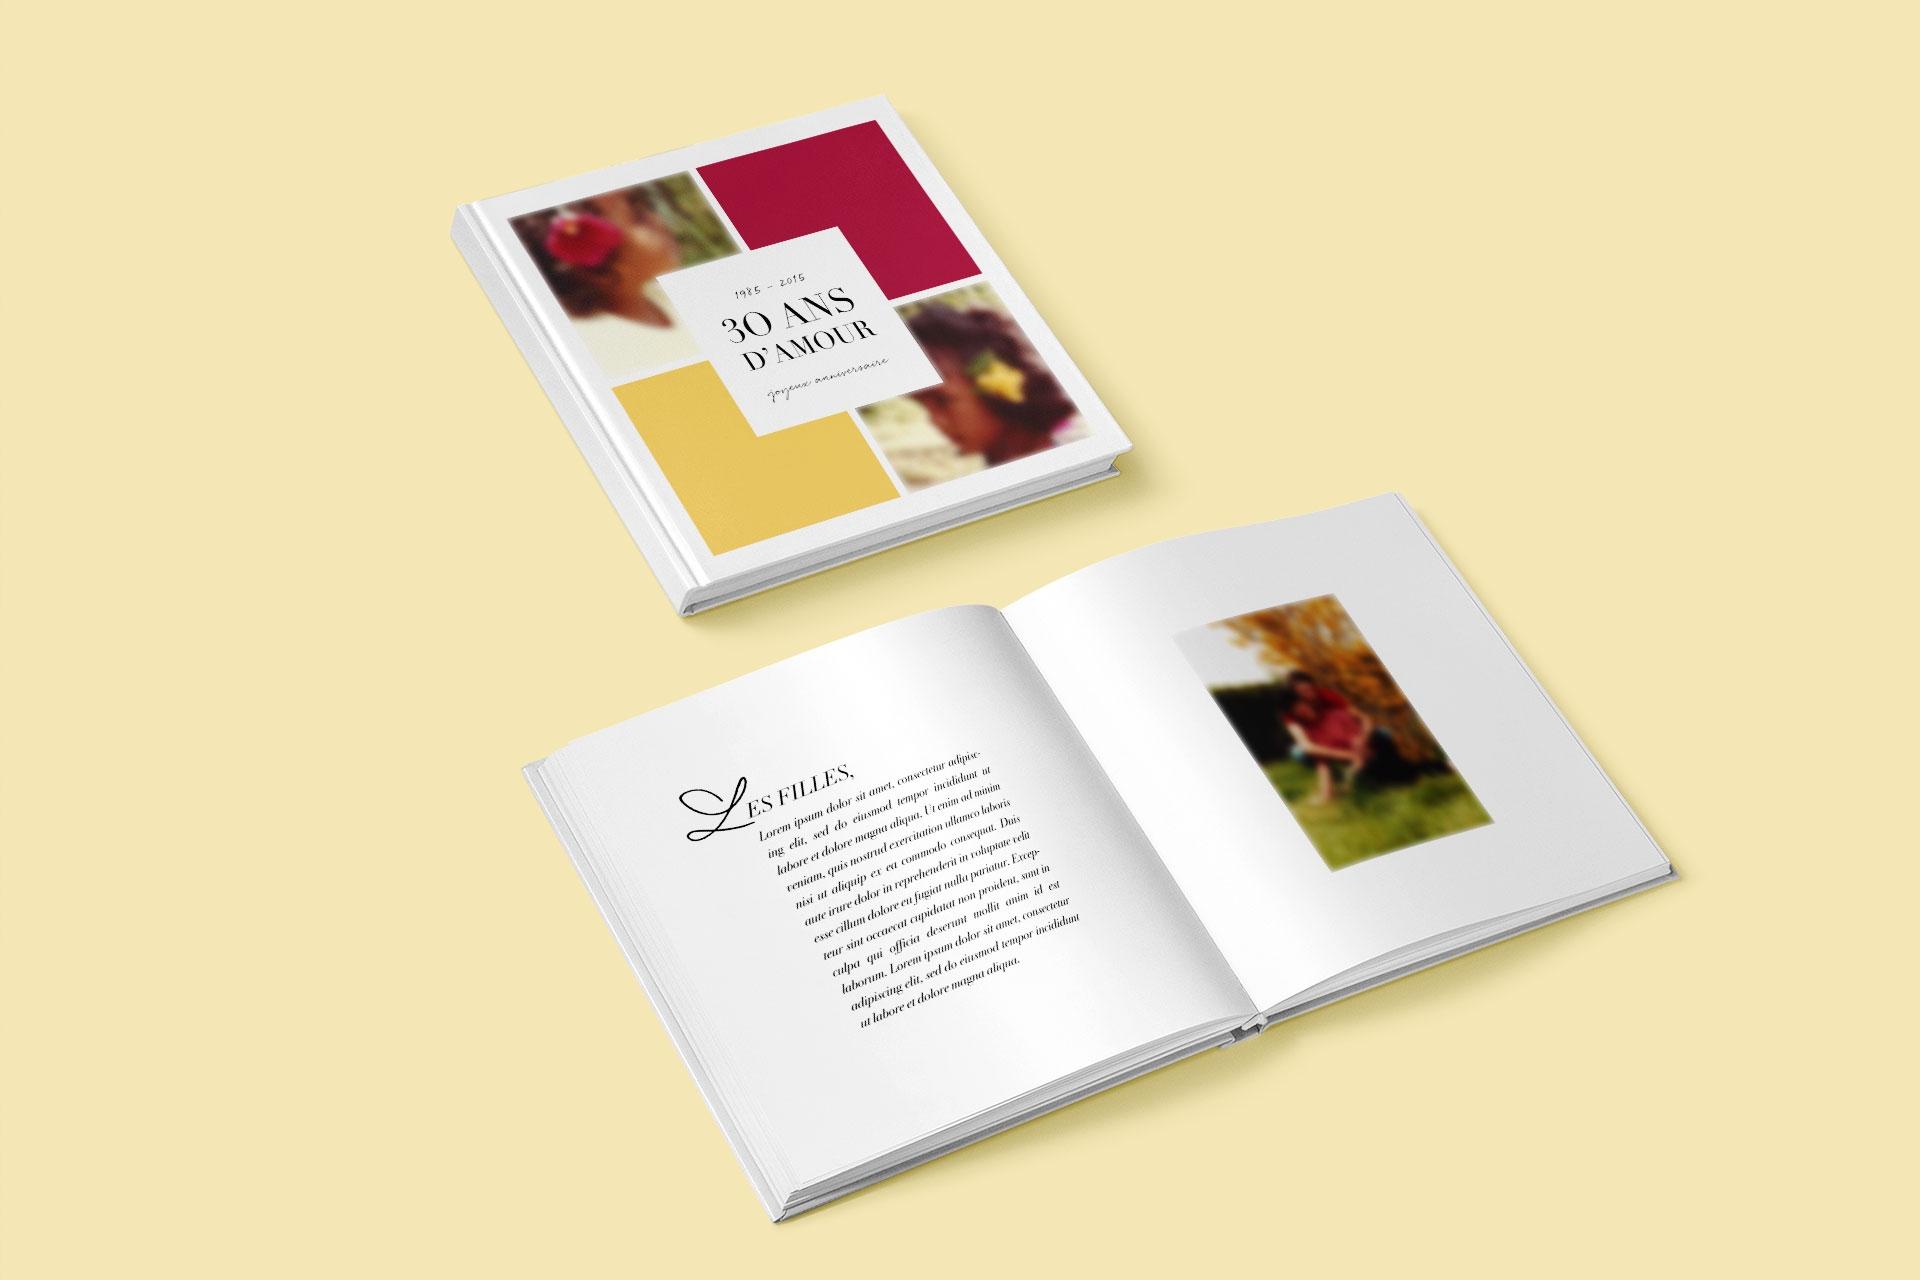 particuliers-creas-album-photo-danielle&hermine